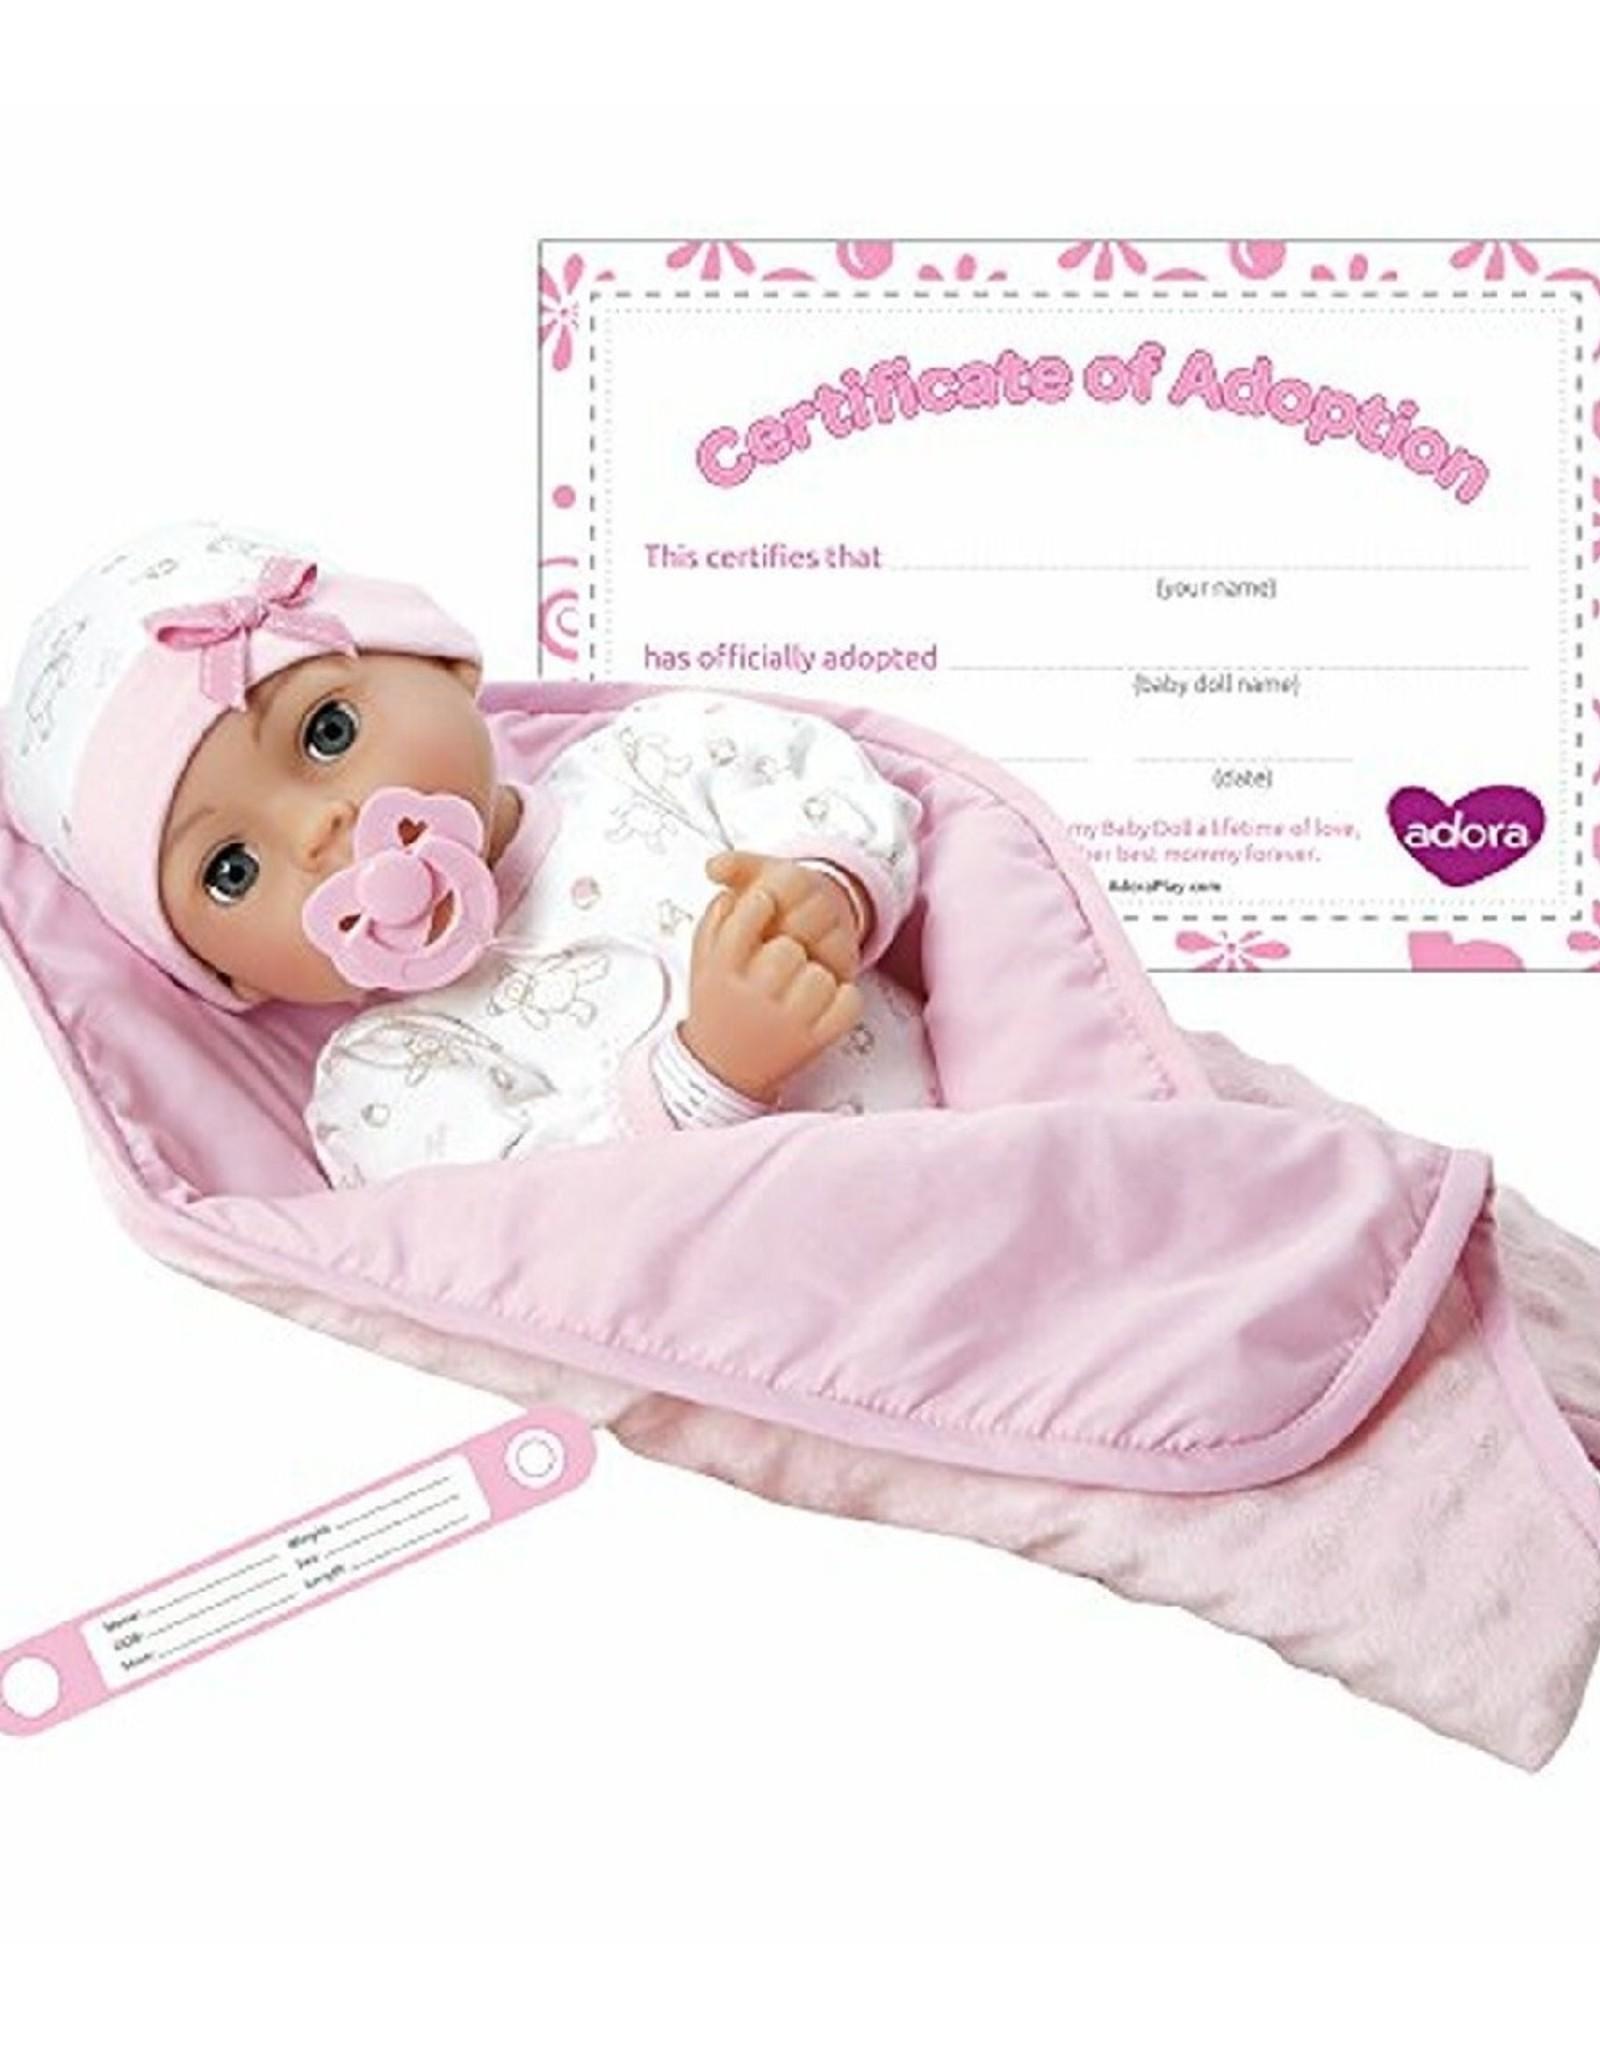 Adora Dolls Adoption Baby - Hope